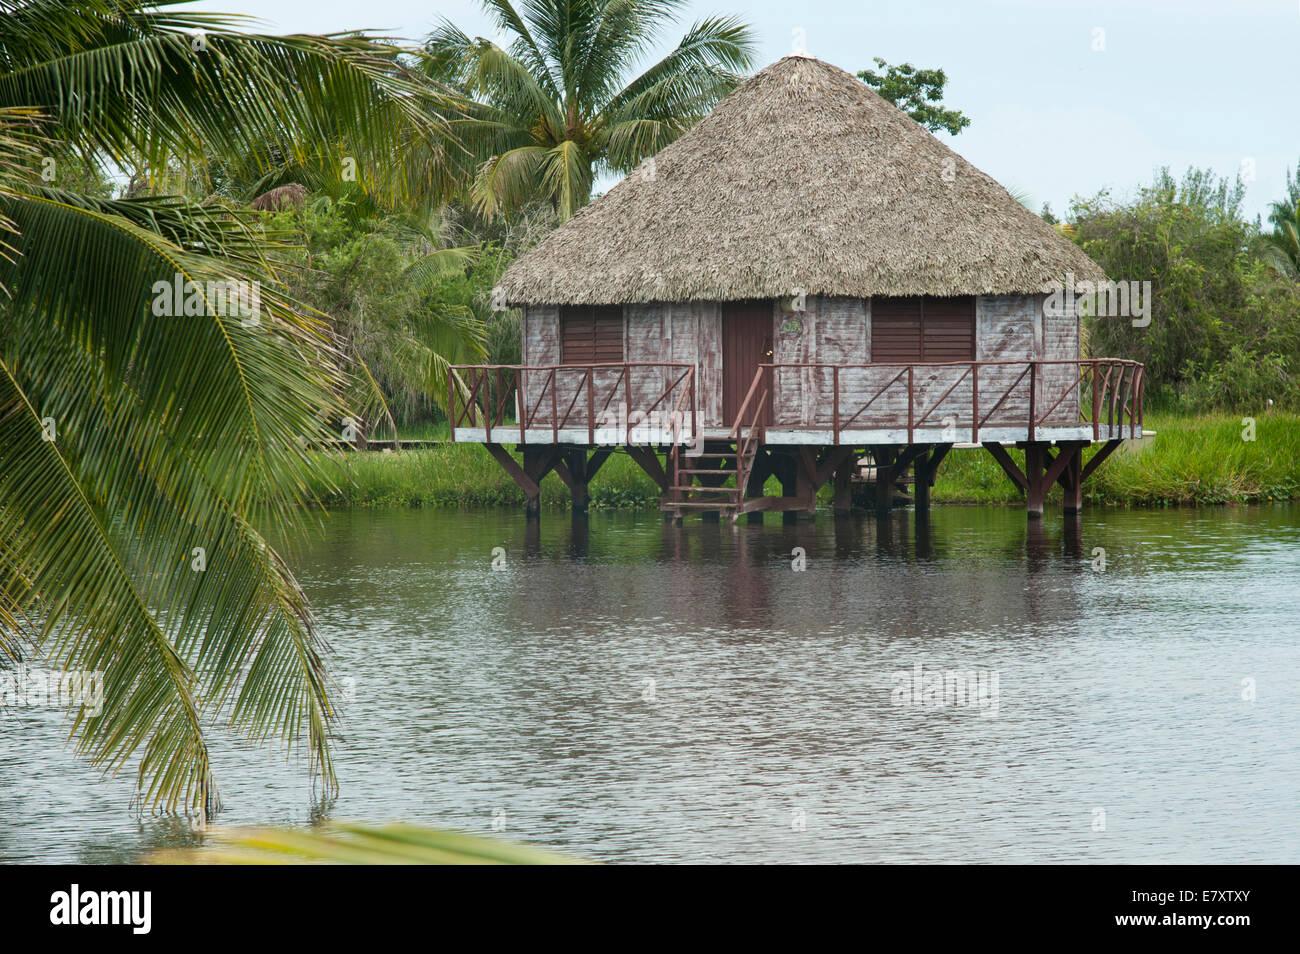 Stilt house in the lake of Lago de Tesoro, Guamá mangrove swamps, Santiago de Cuba Province, Cuba - Stock Image